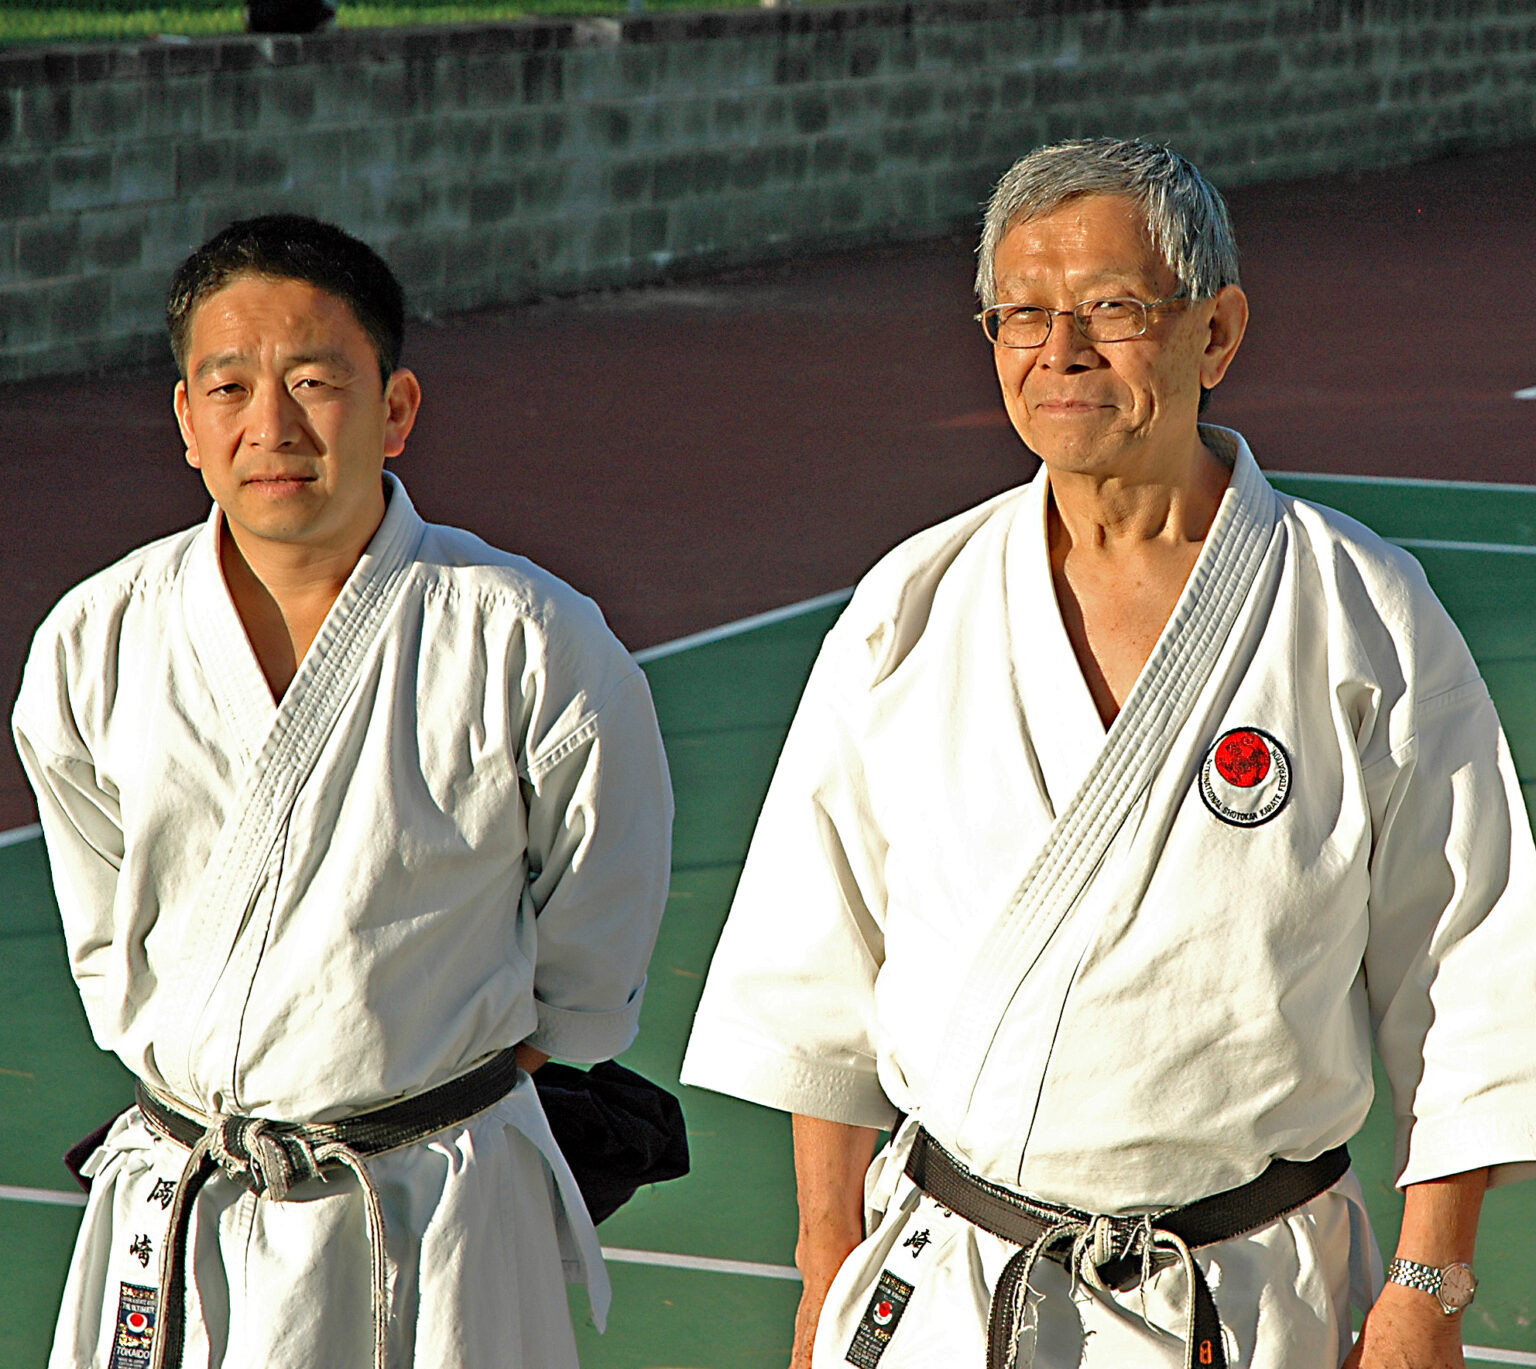 Teruyuki Okazaki, right, one of the founders of the International Shotokan Karate Federation, has passed away ©ISKF